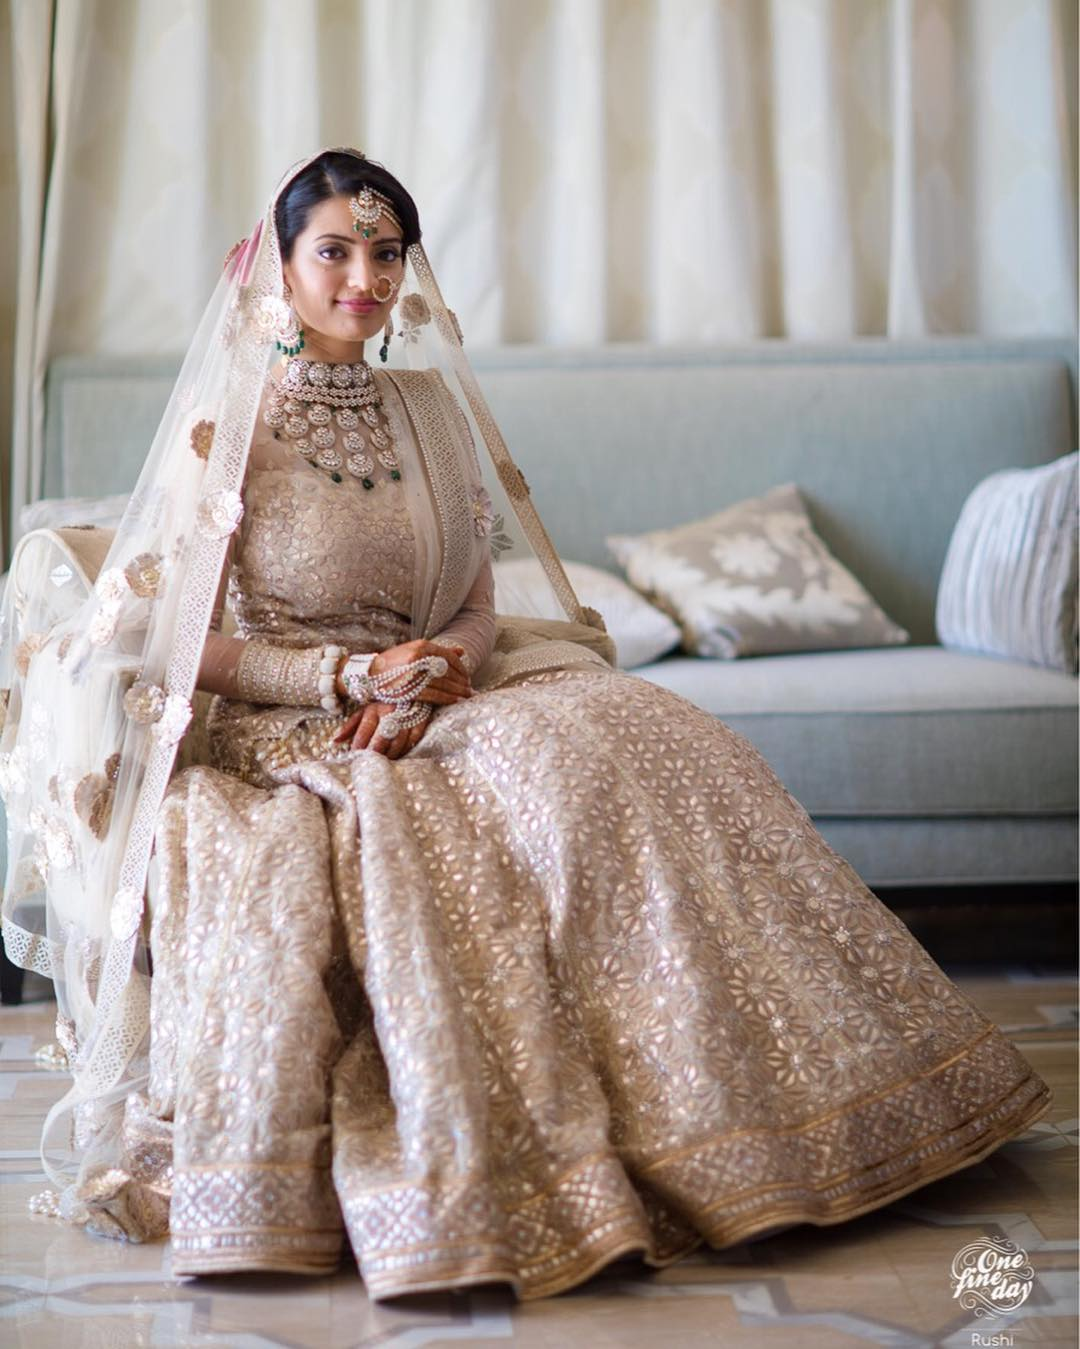 Wedding Dress S In Niagara Falls New York Ficts